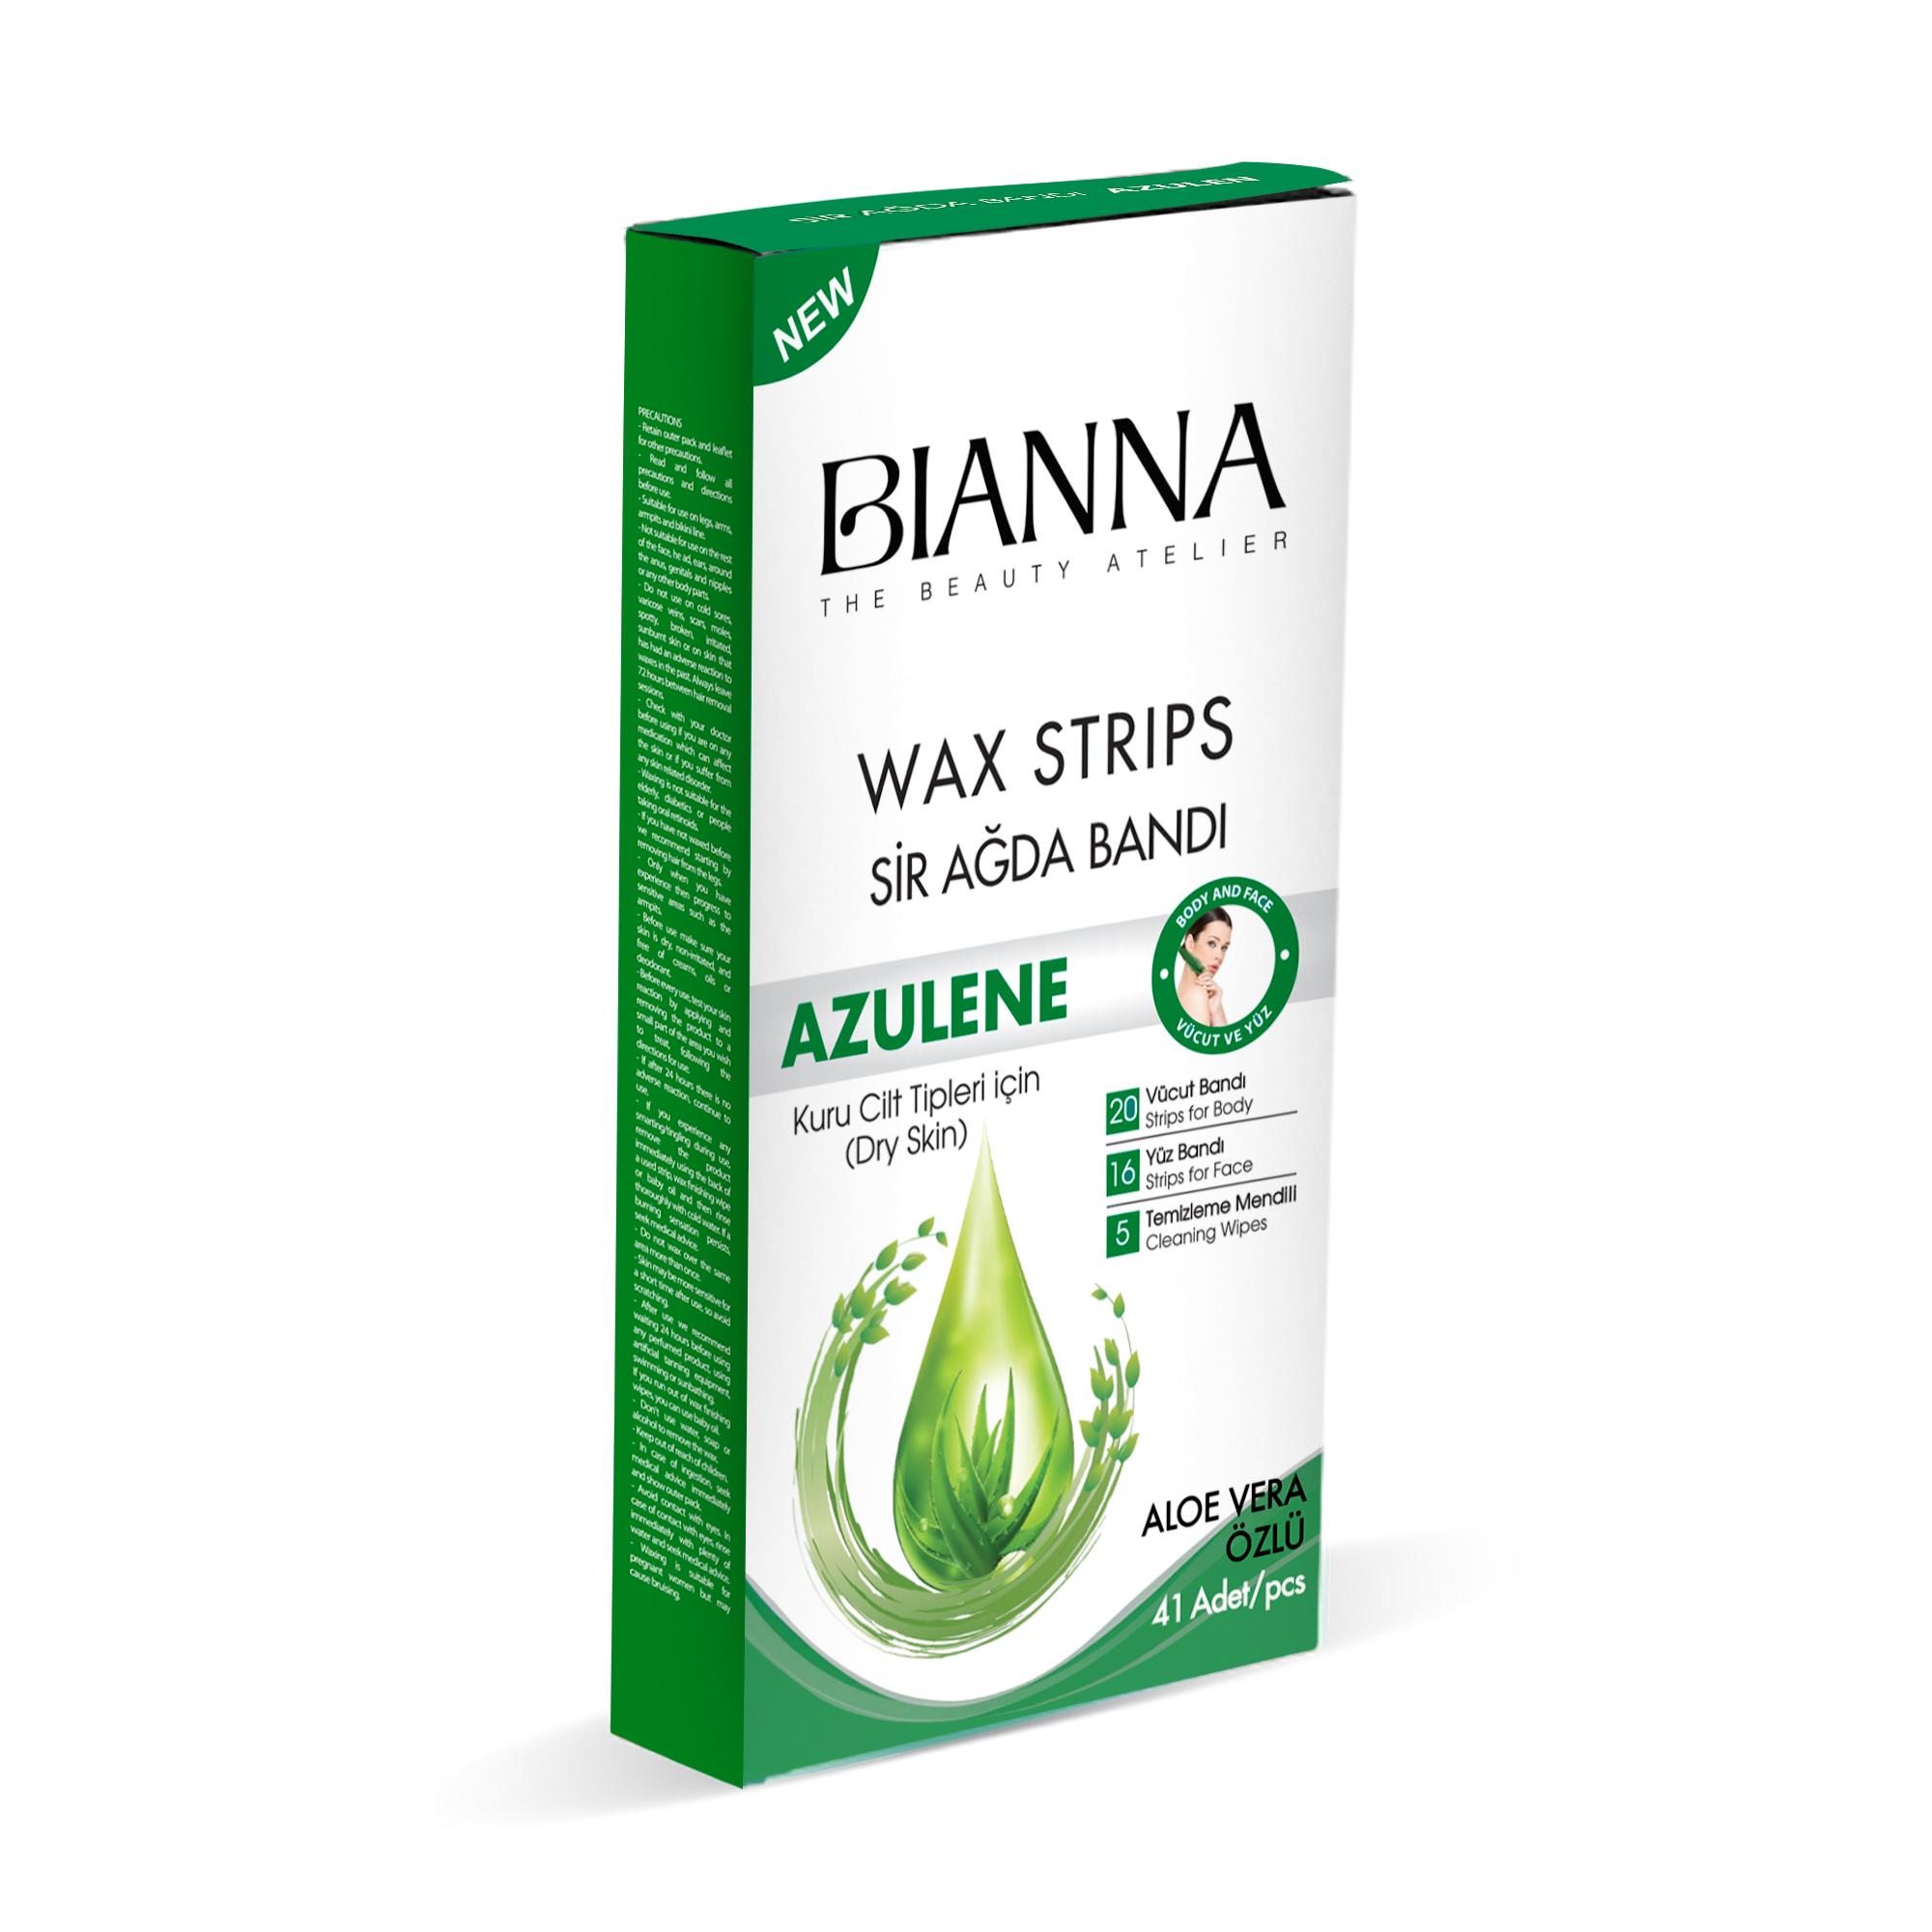 BIANNA LIPOSOLUABLE WAX STRIP SET - AZULENE / 4226-02